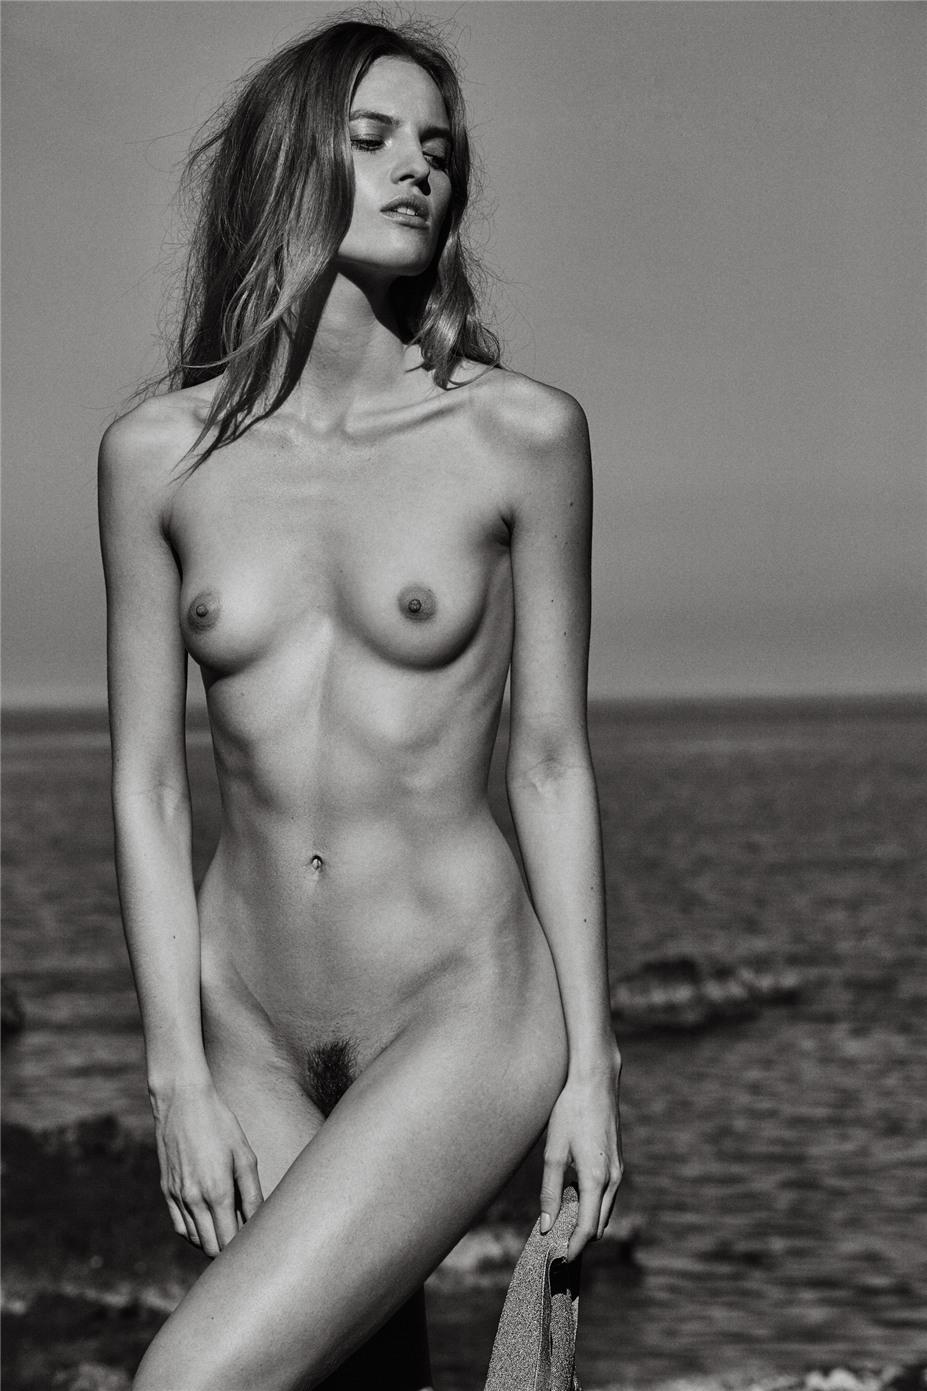 Обнаженные девушки на пляжах Ибицы / Ibiza Nudes by Diane Betties - Folke